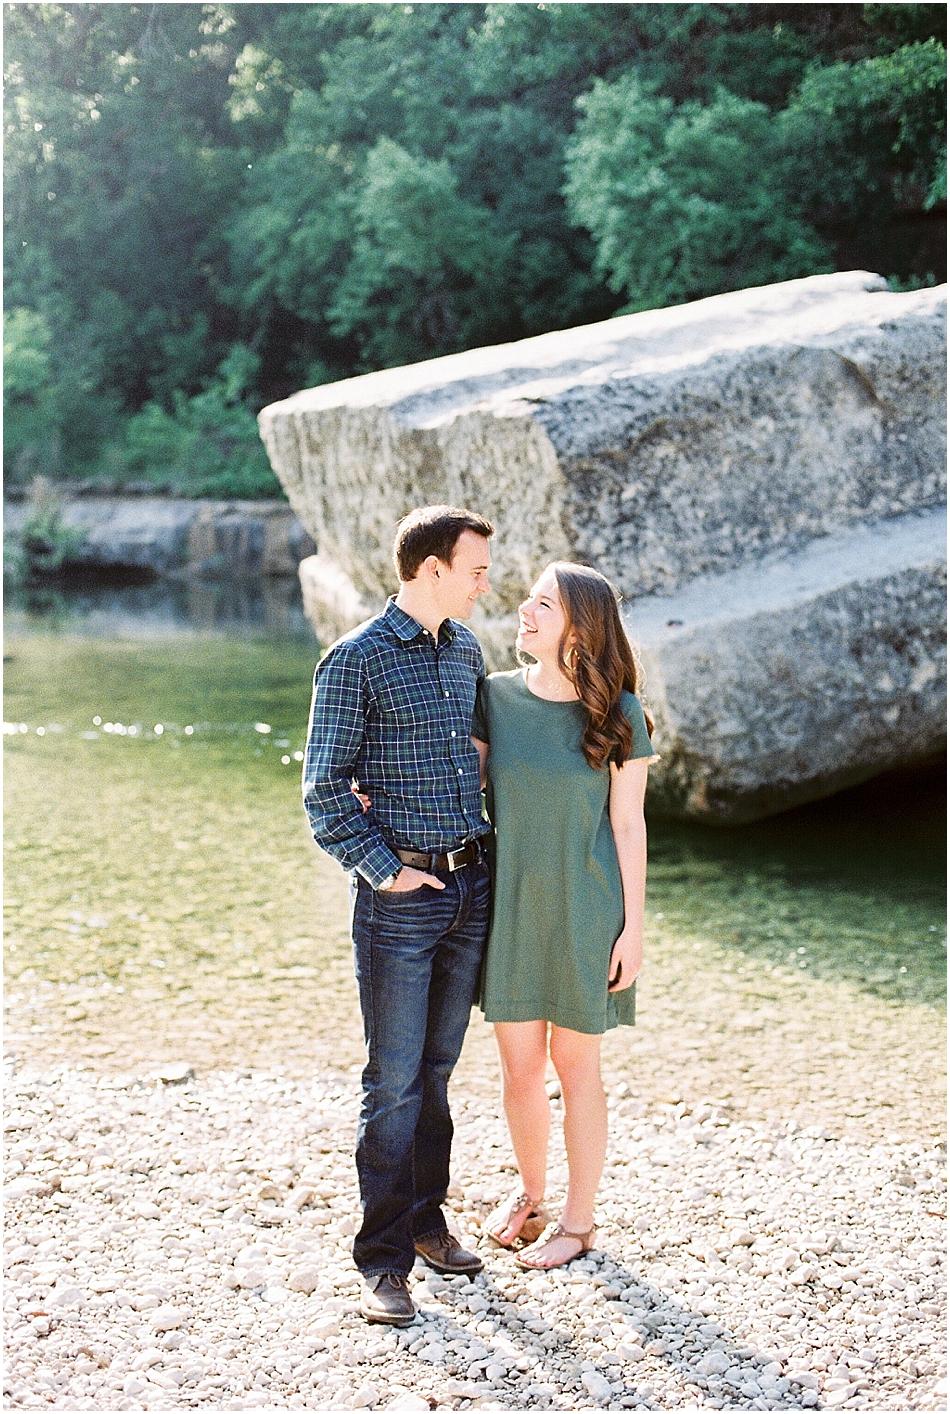 Laura + Nick | Engagement | Fine Art Film | Austin Texas | Emilie Anne Photography-2.jpg